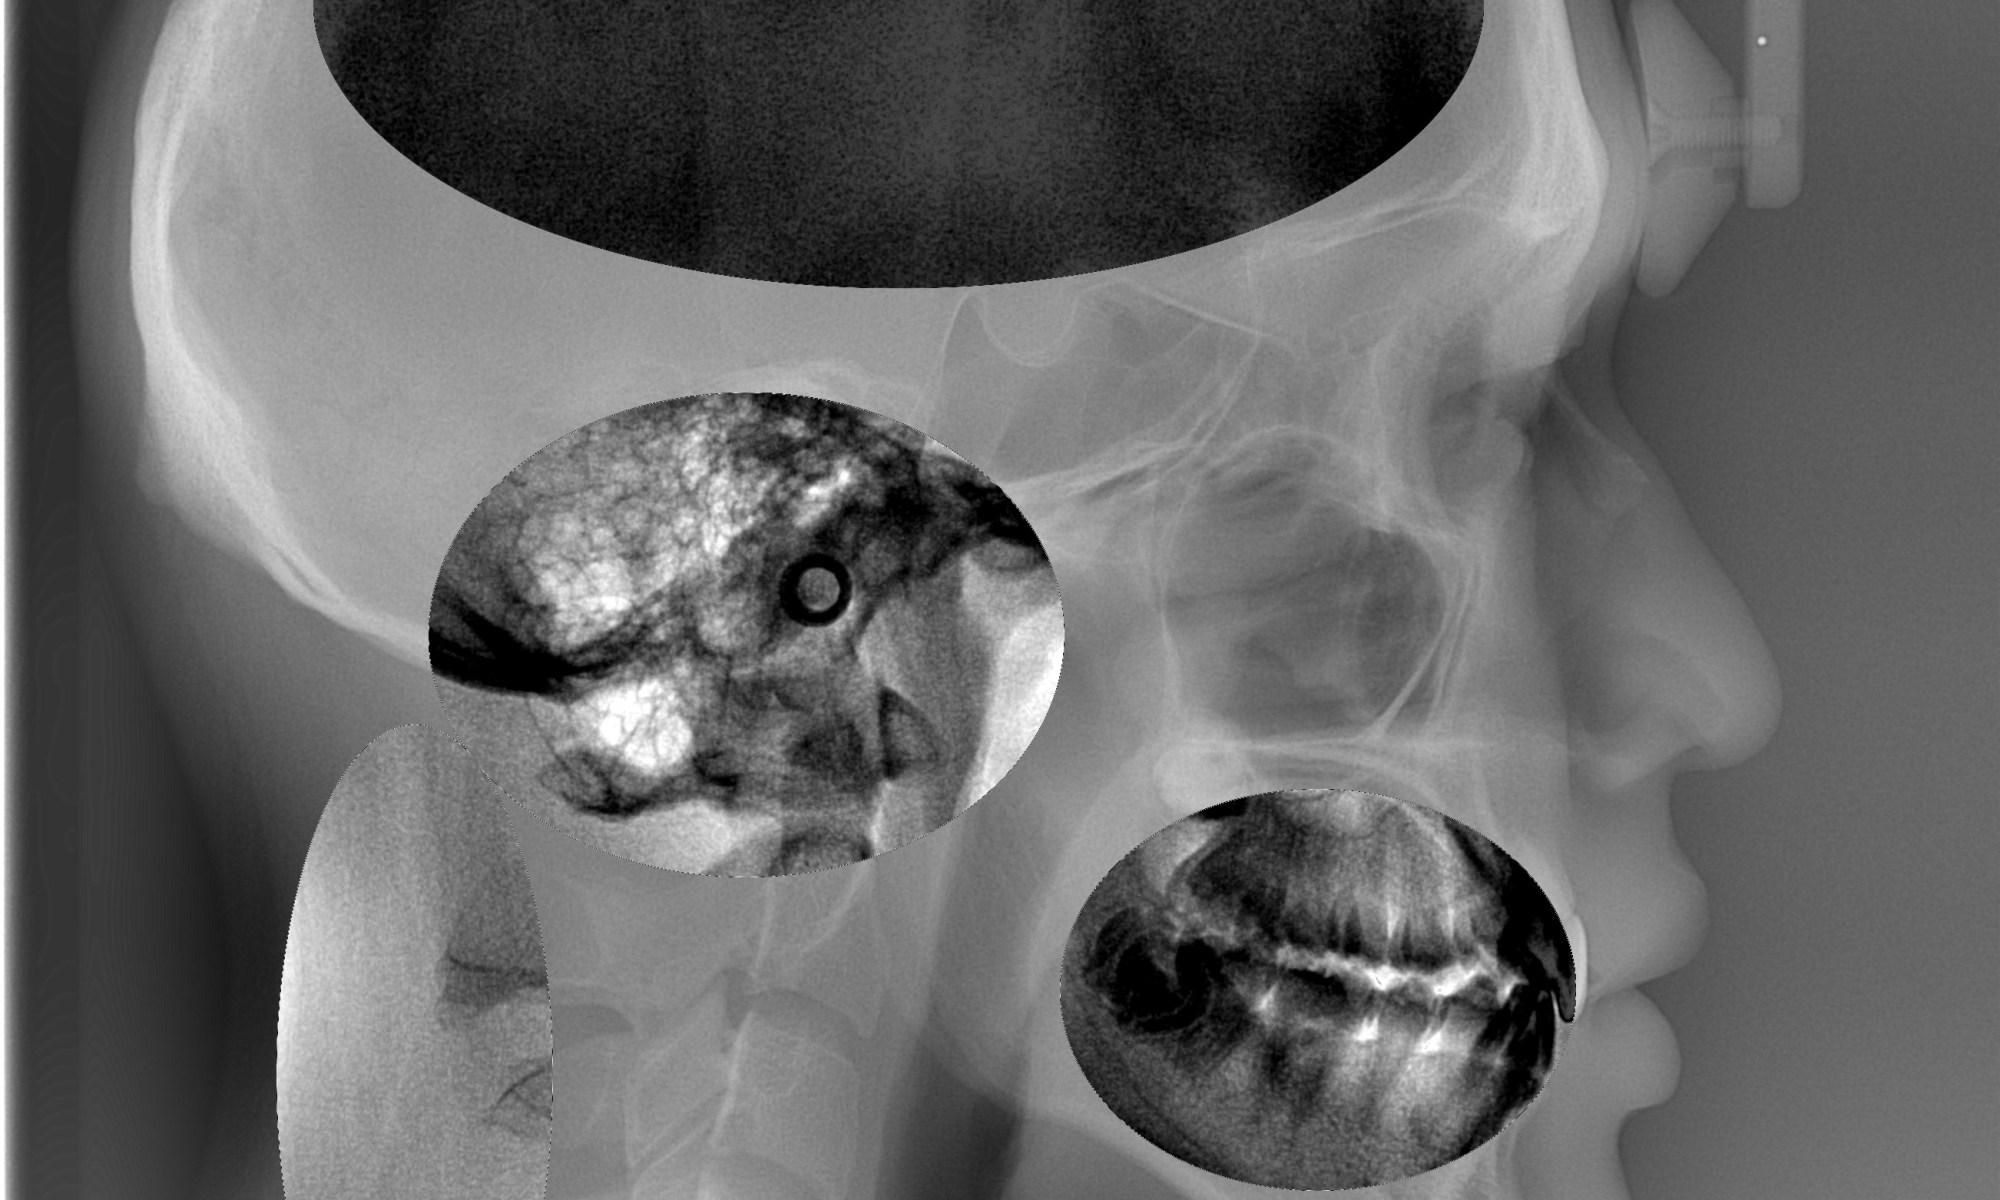 Head X-ray - Inversed X-ray Sense Scan